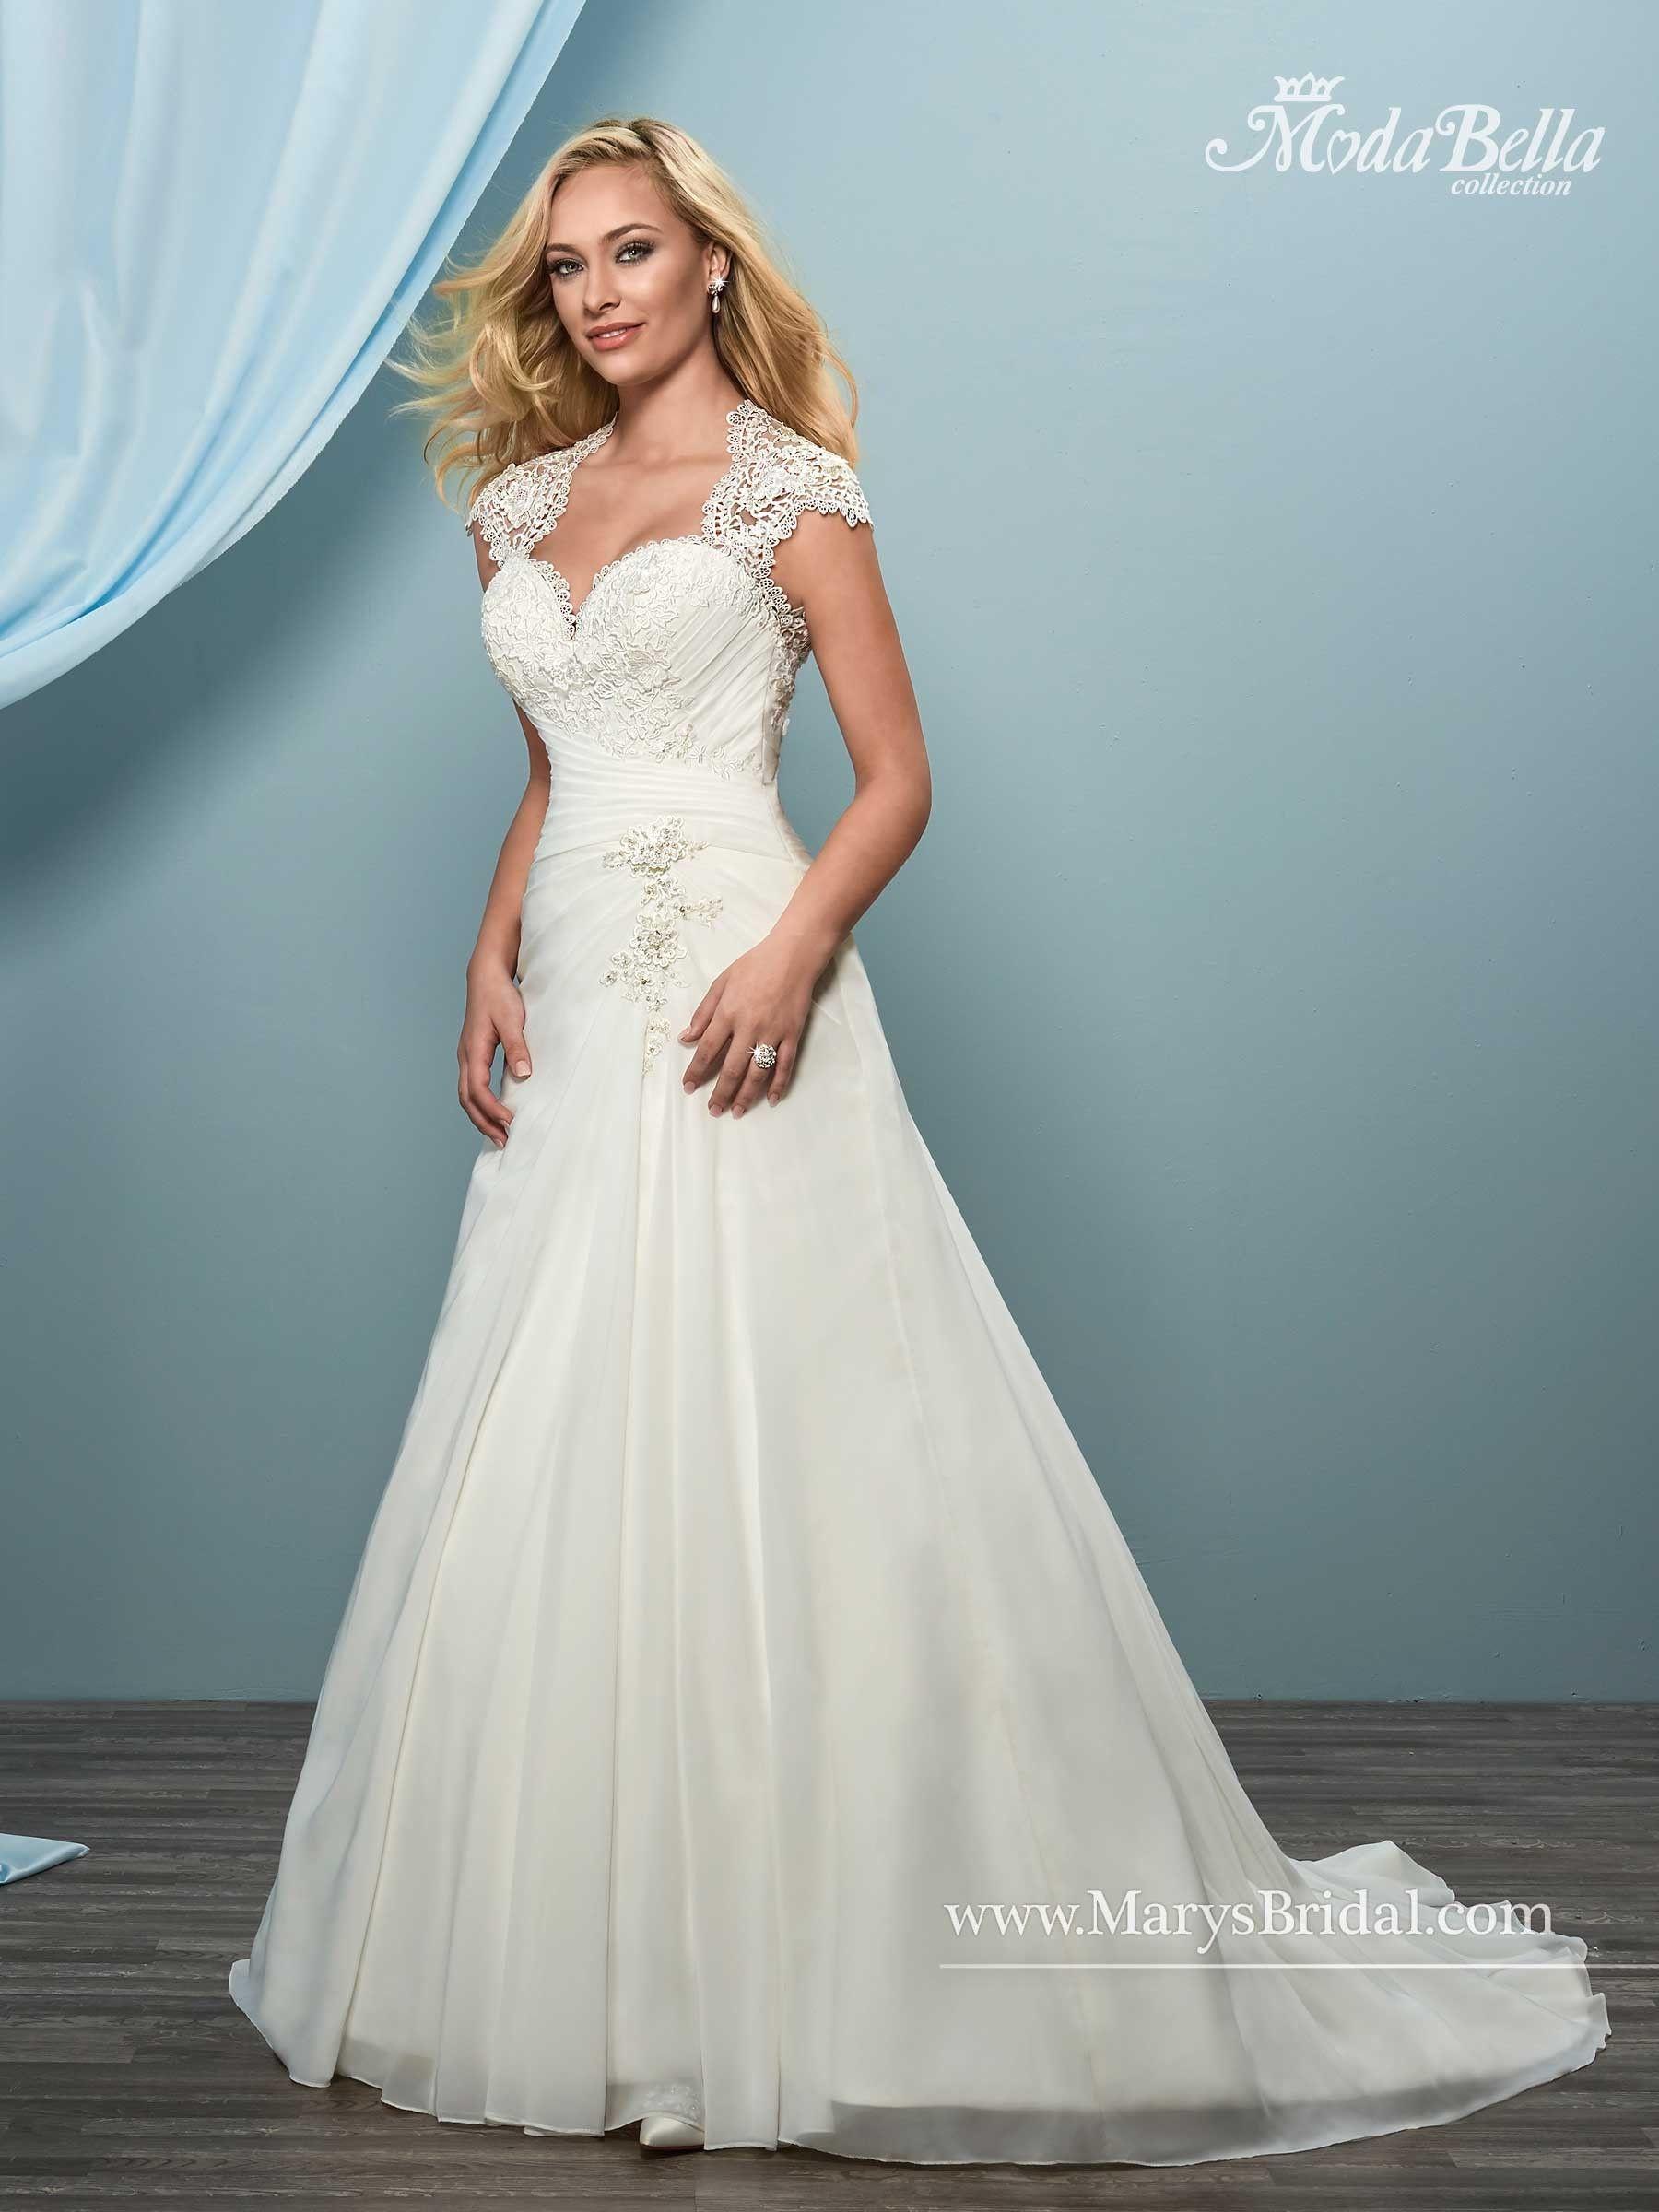 $558 Wedding Dresses, Bridesmaid Dresses, Prom Dresses and Bridal ...